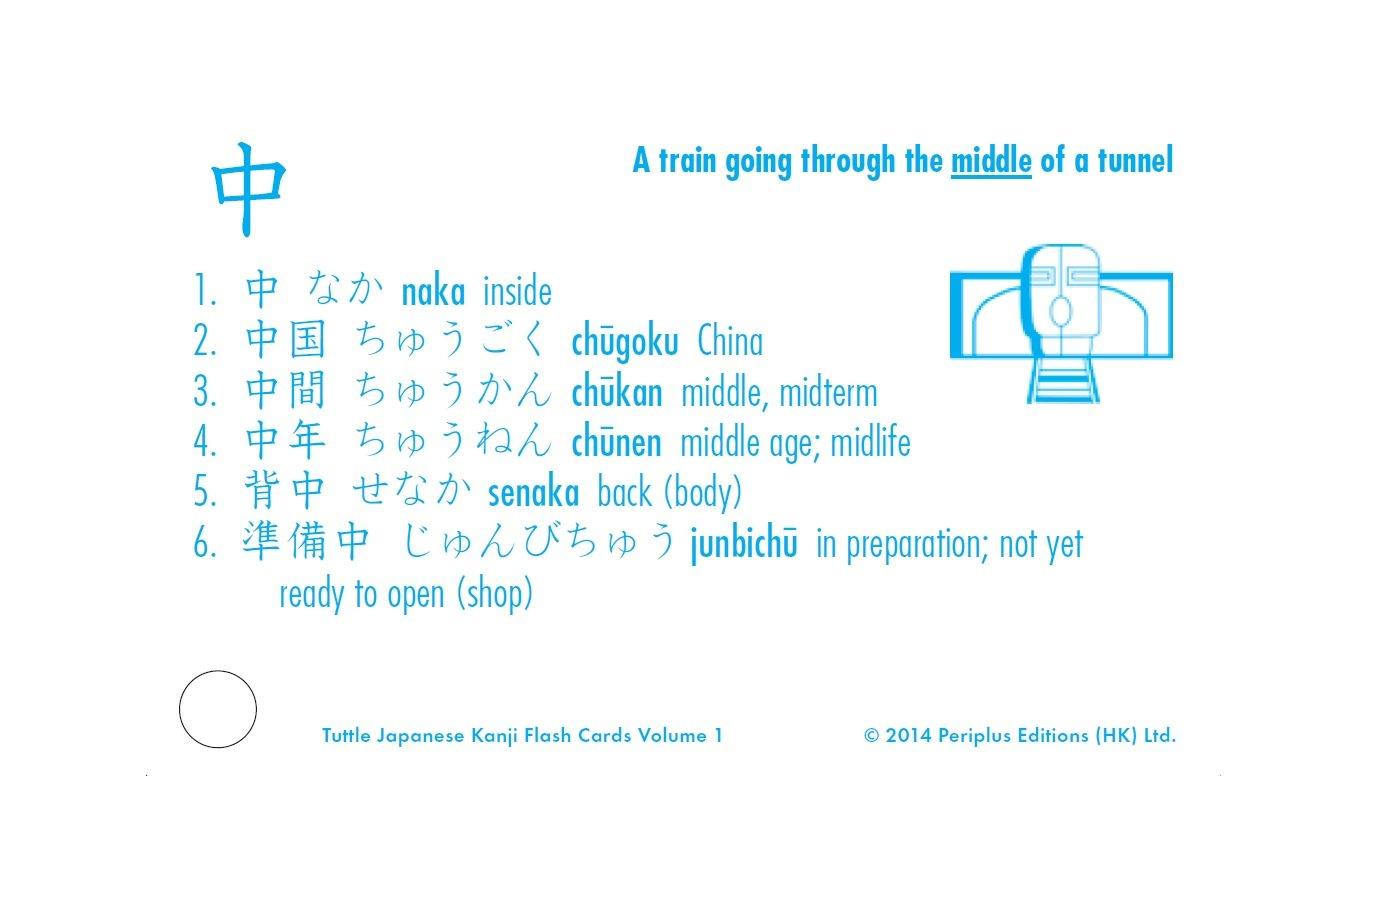 Amazon japanese kanji flash cards kit vol 1 kanji 1 200 amazon japanese kanji flash cards kit vol 1 kanji 1 200 jlpt beginning level book cd 9784805311745 alexander kask emiko konomi phd books biocorpaavc Images